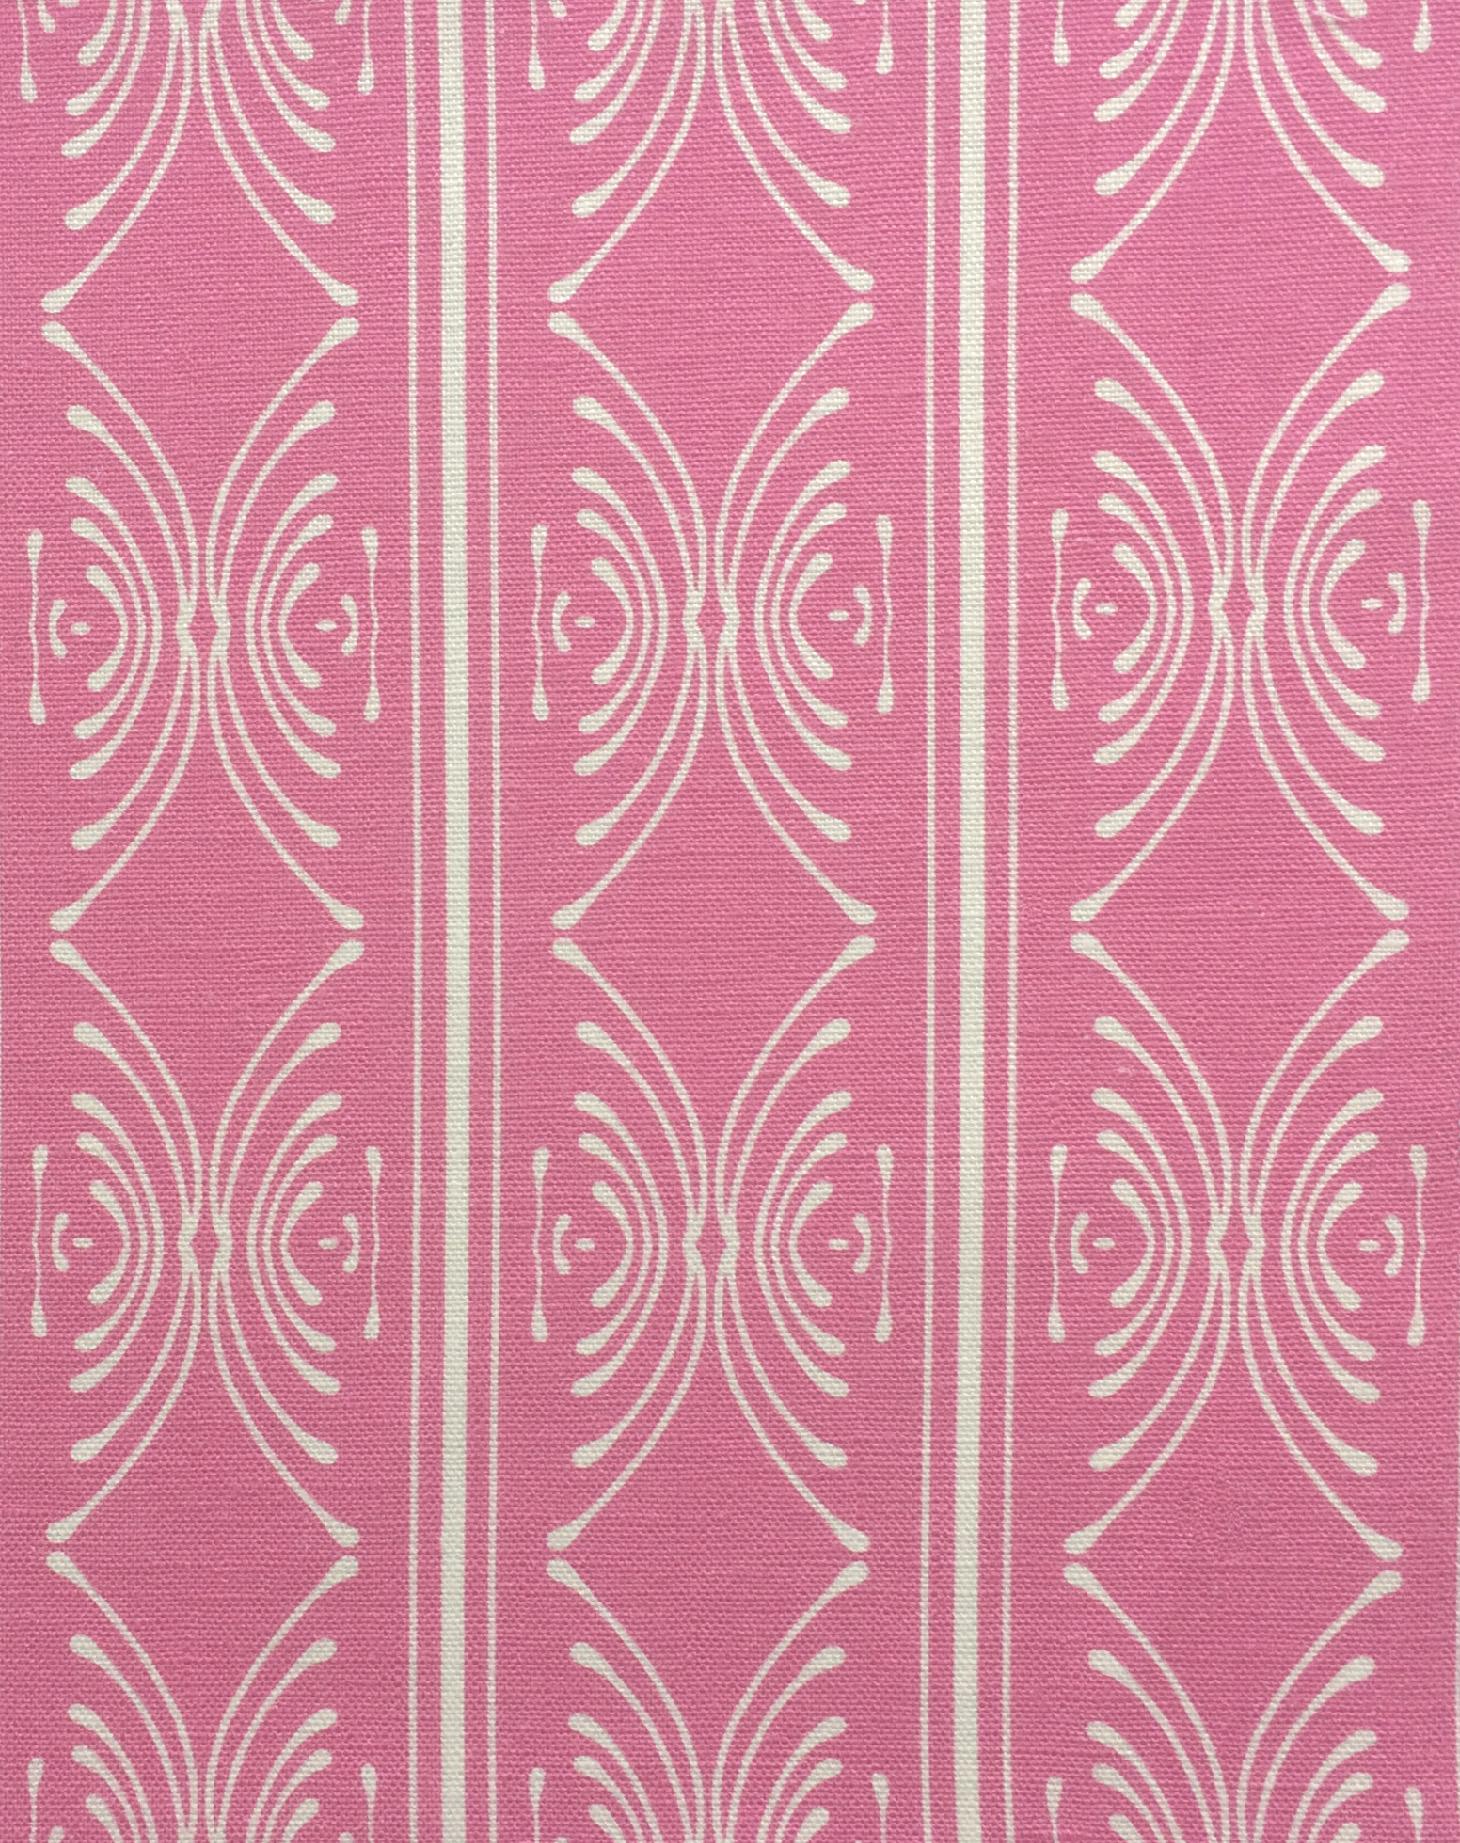 Small Kris Kross: Pink